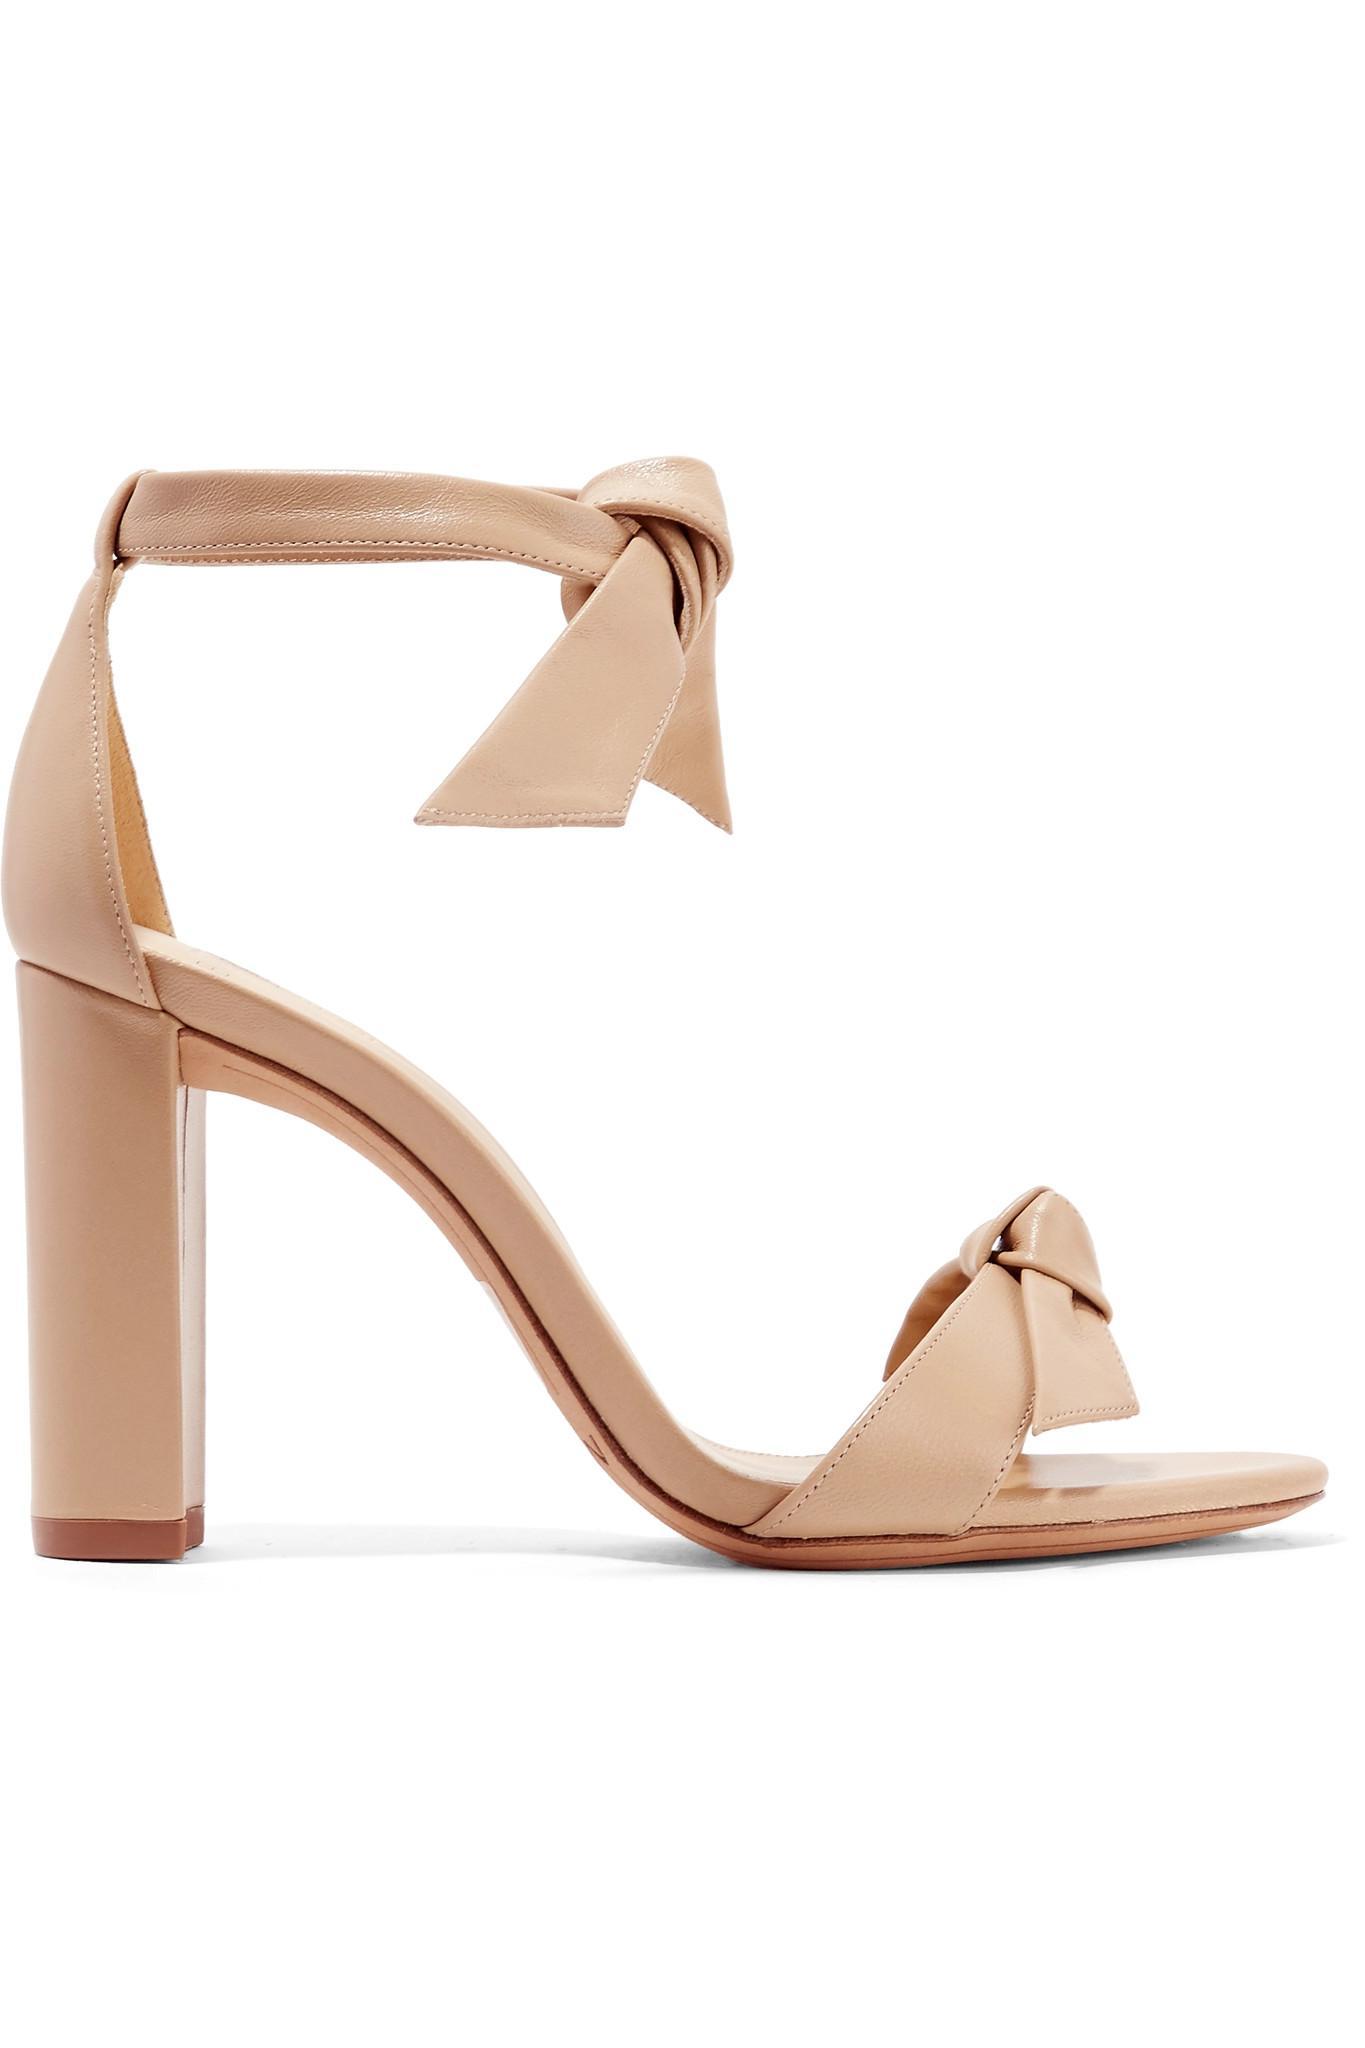 0aff4d3dafdf Lyst - Alexandre Birman Clarita Bow-embellished Leather Sandals in ...